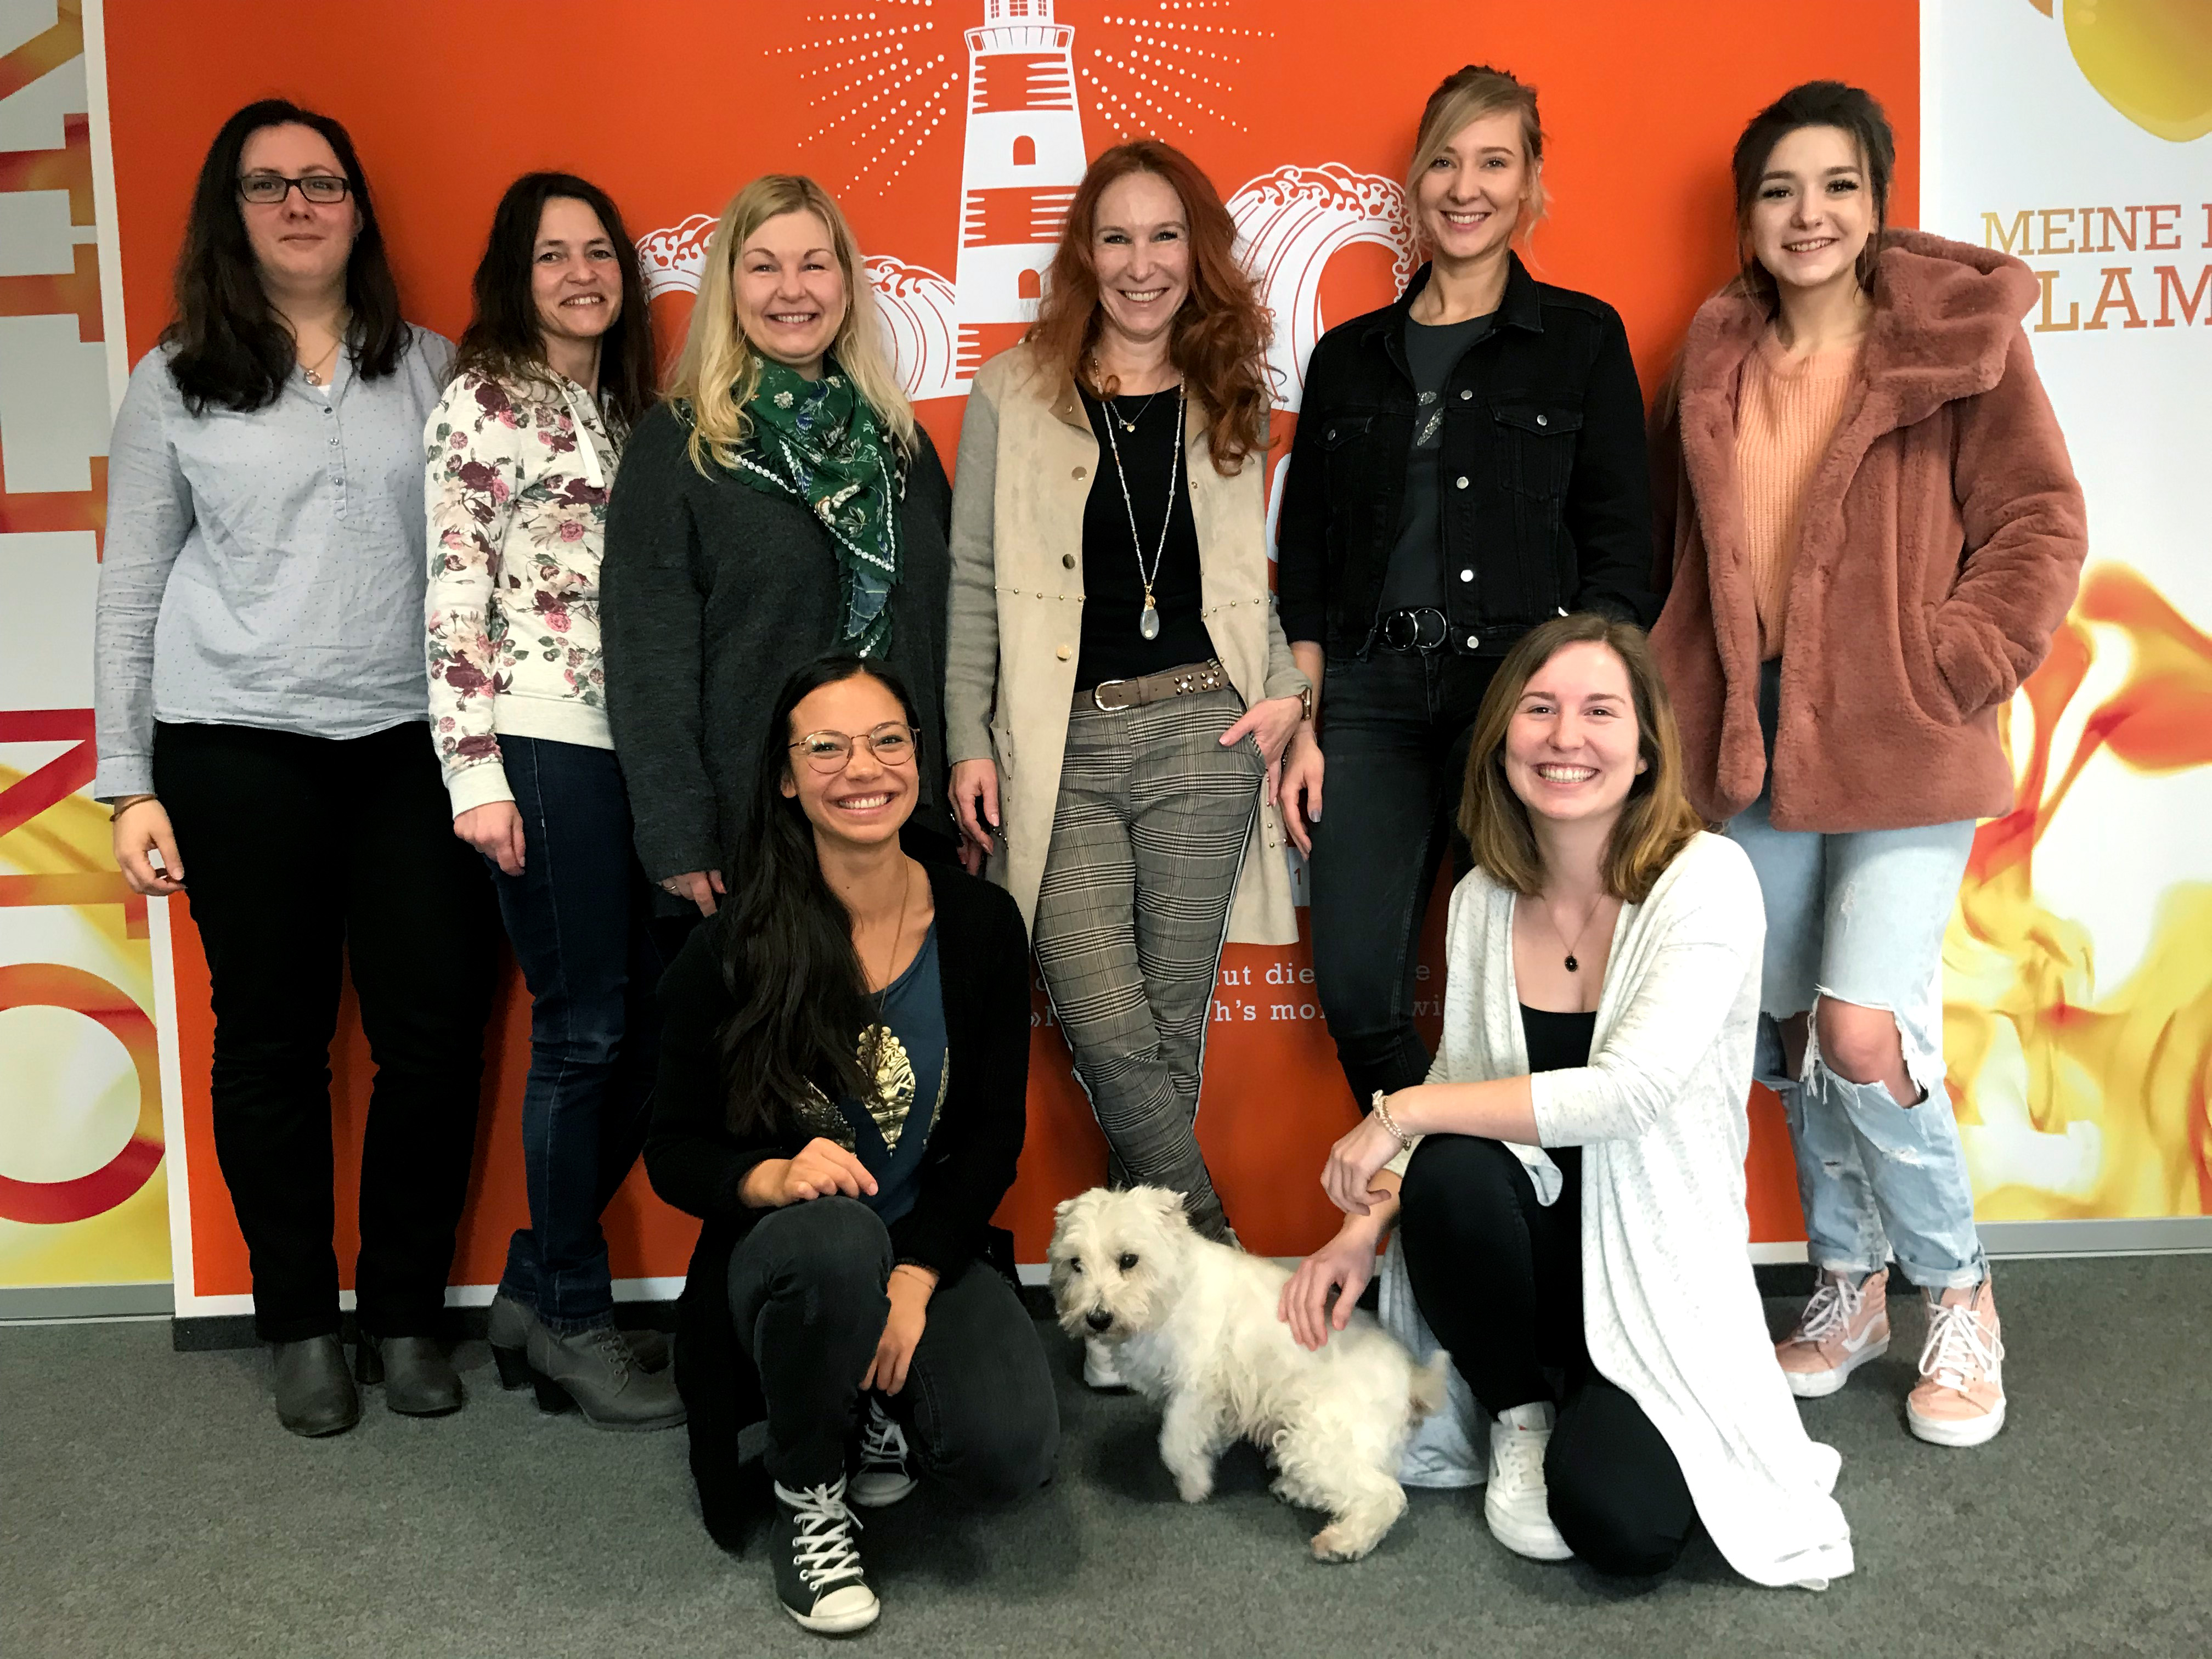 Sabath Media Blog - Frauenpower! - Bild 1